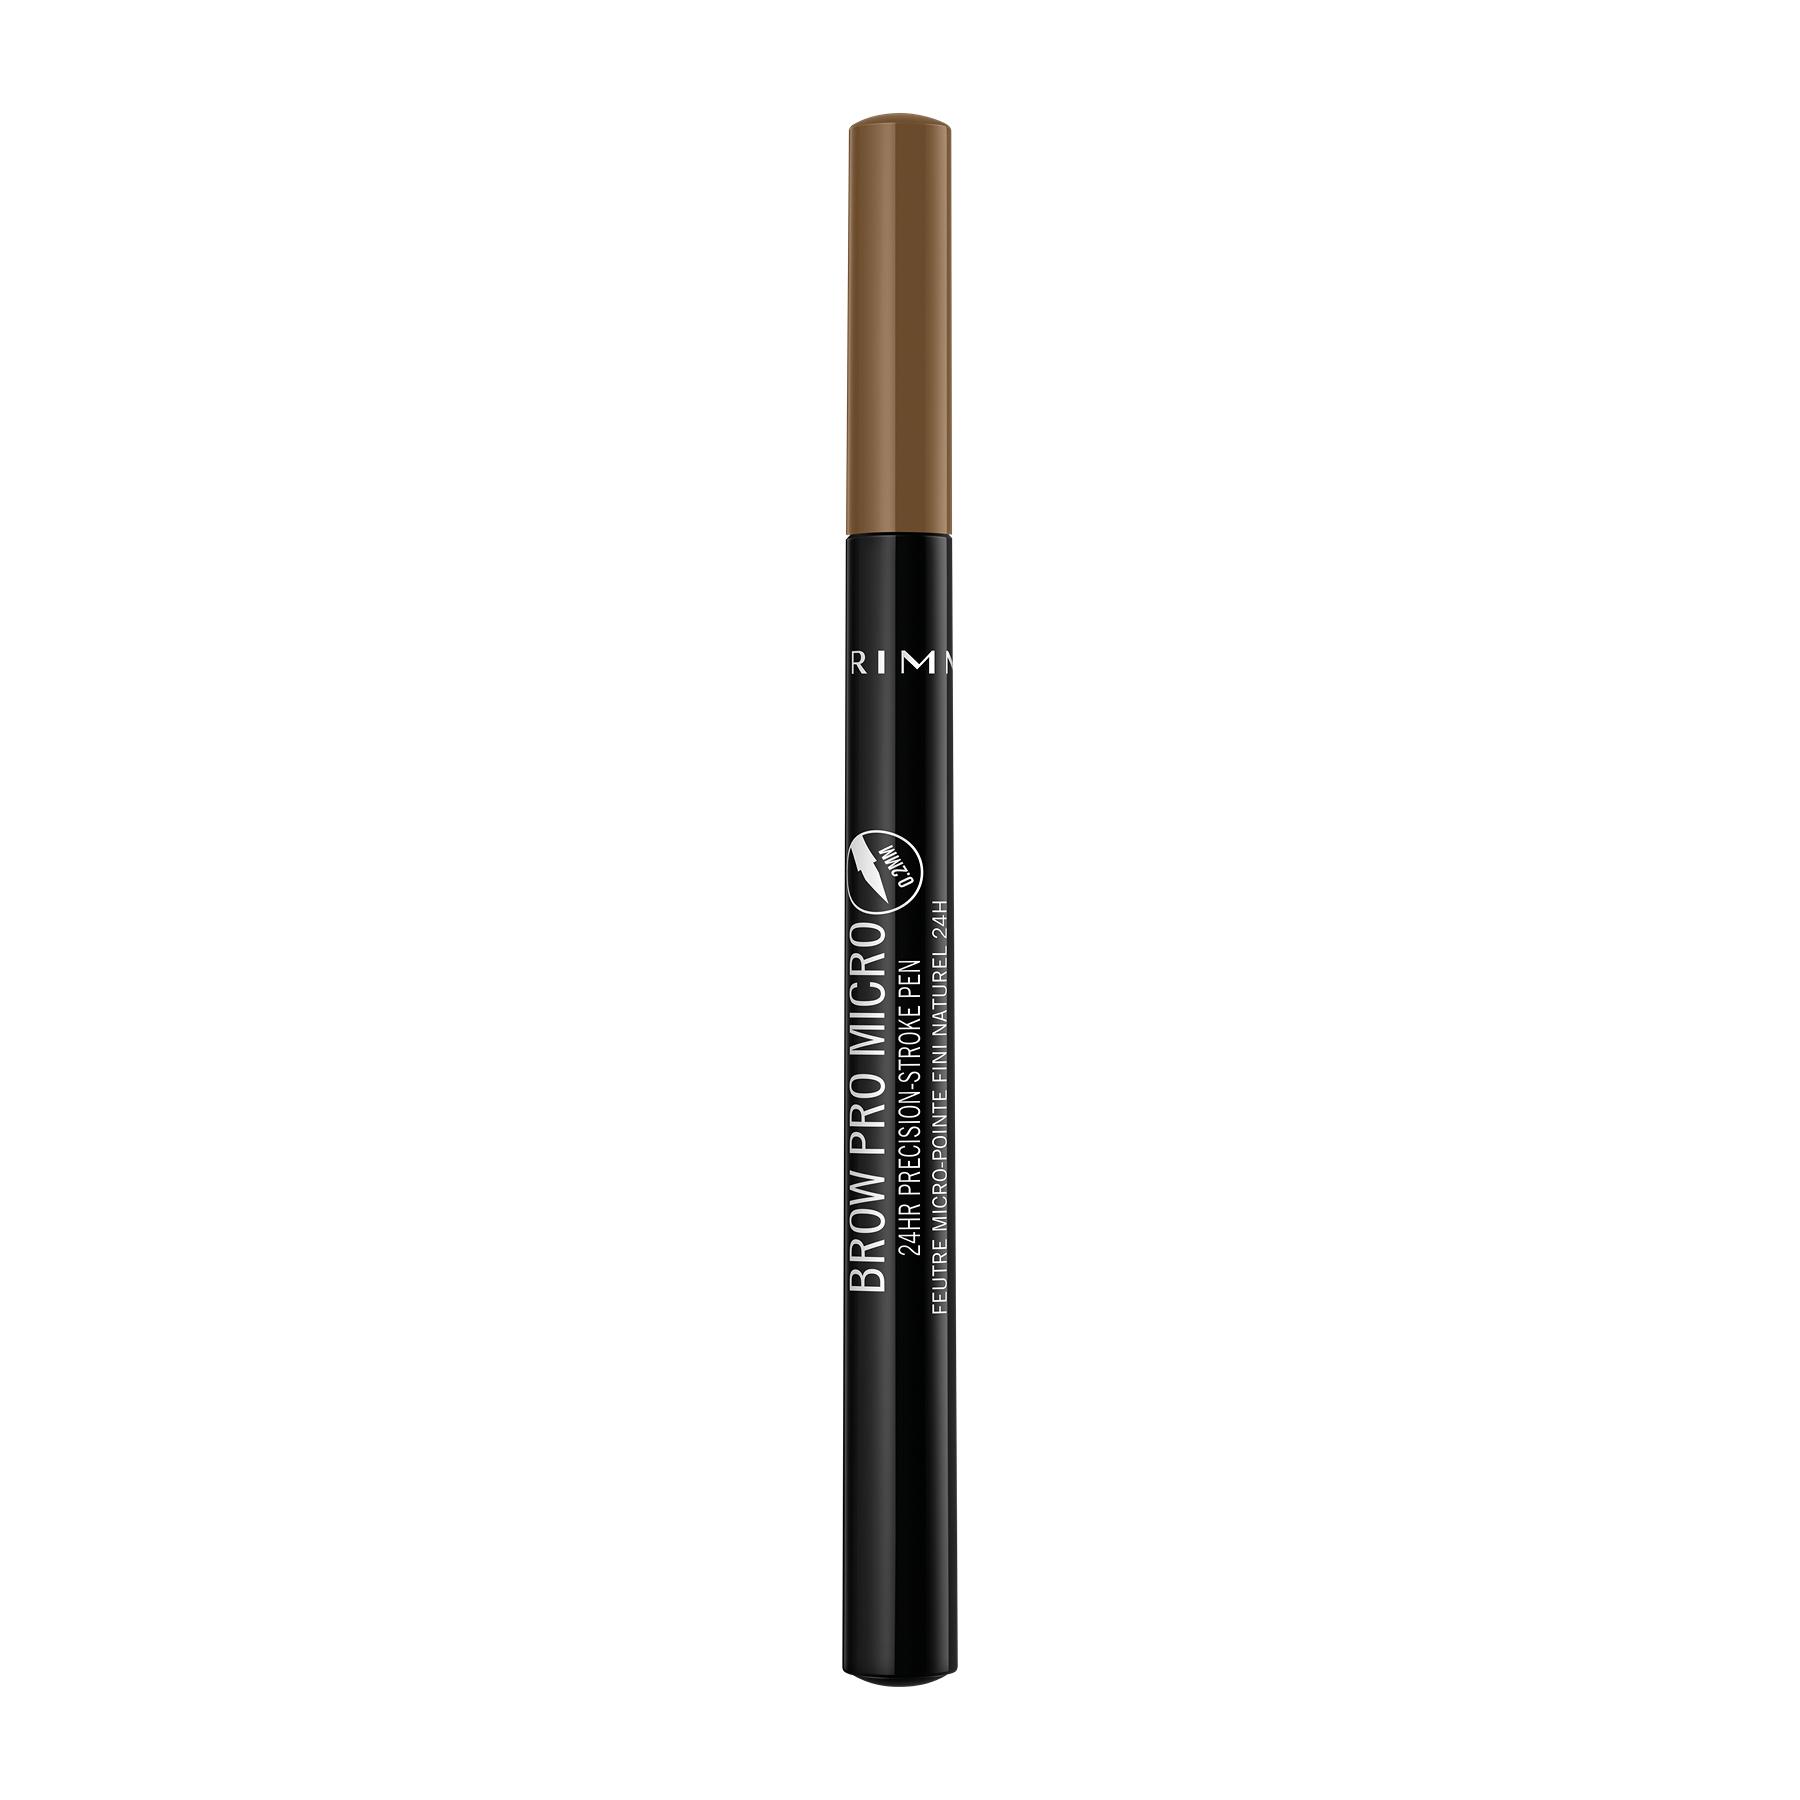 Rimmel London Brow Pro Micro 24HR Precision Stroke Pen in Blonde